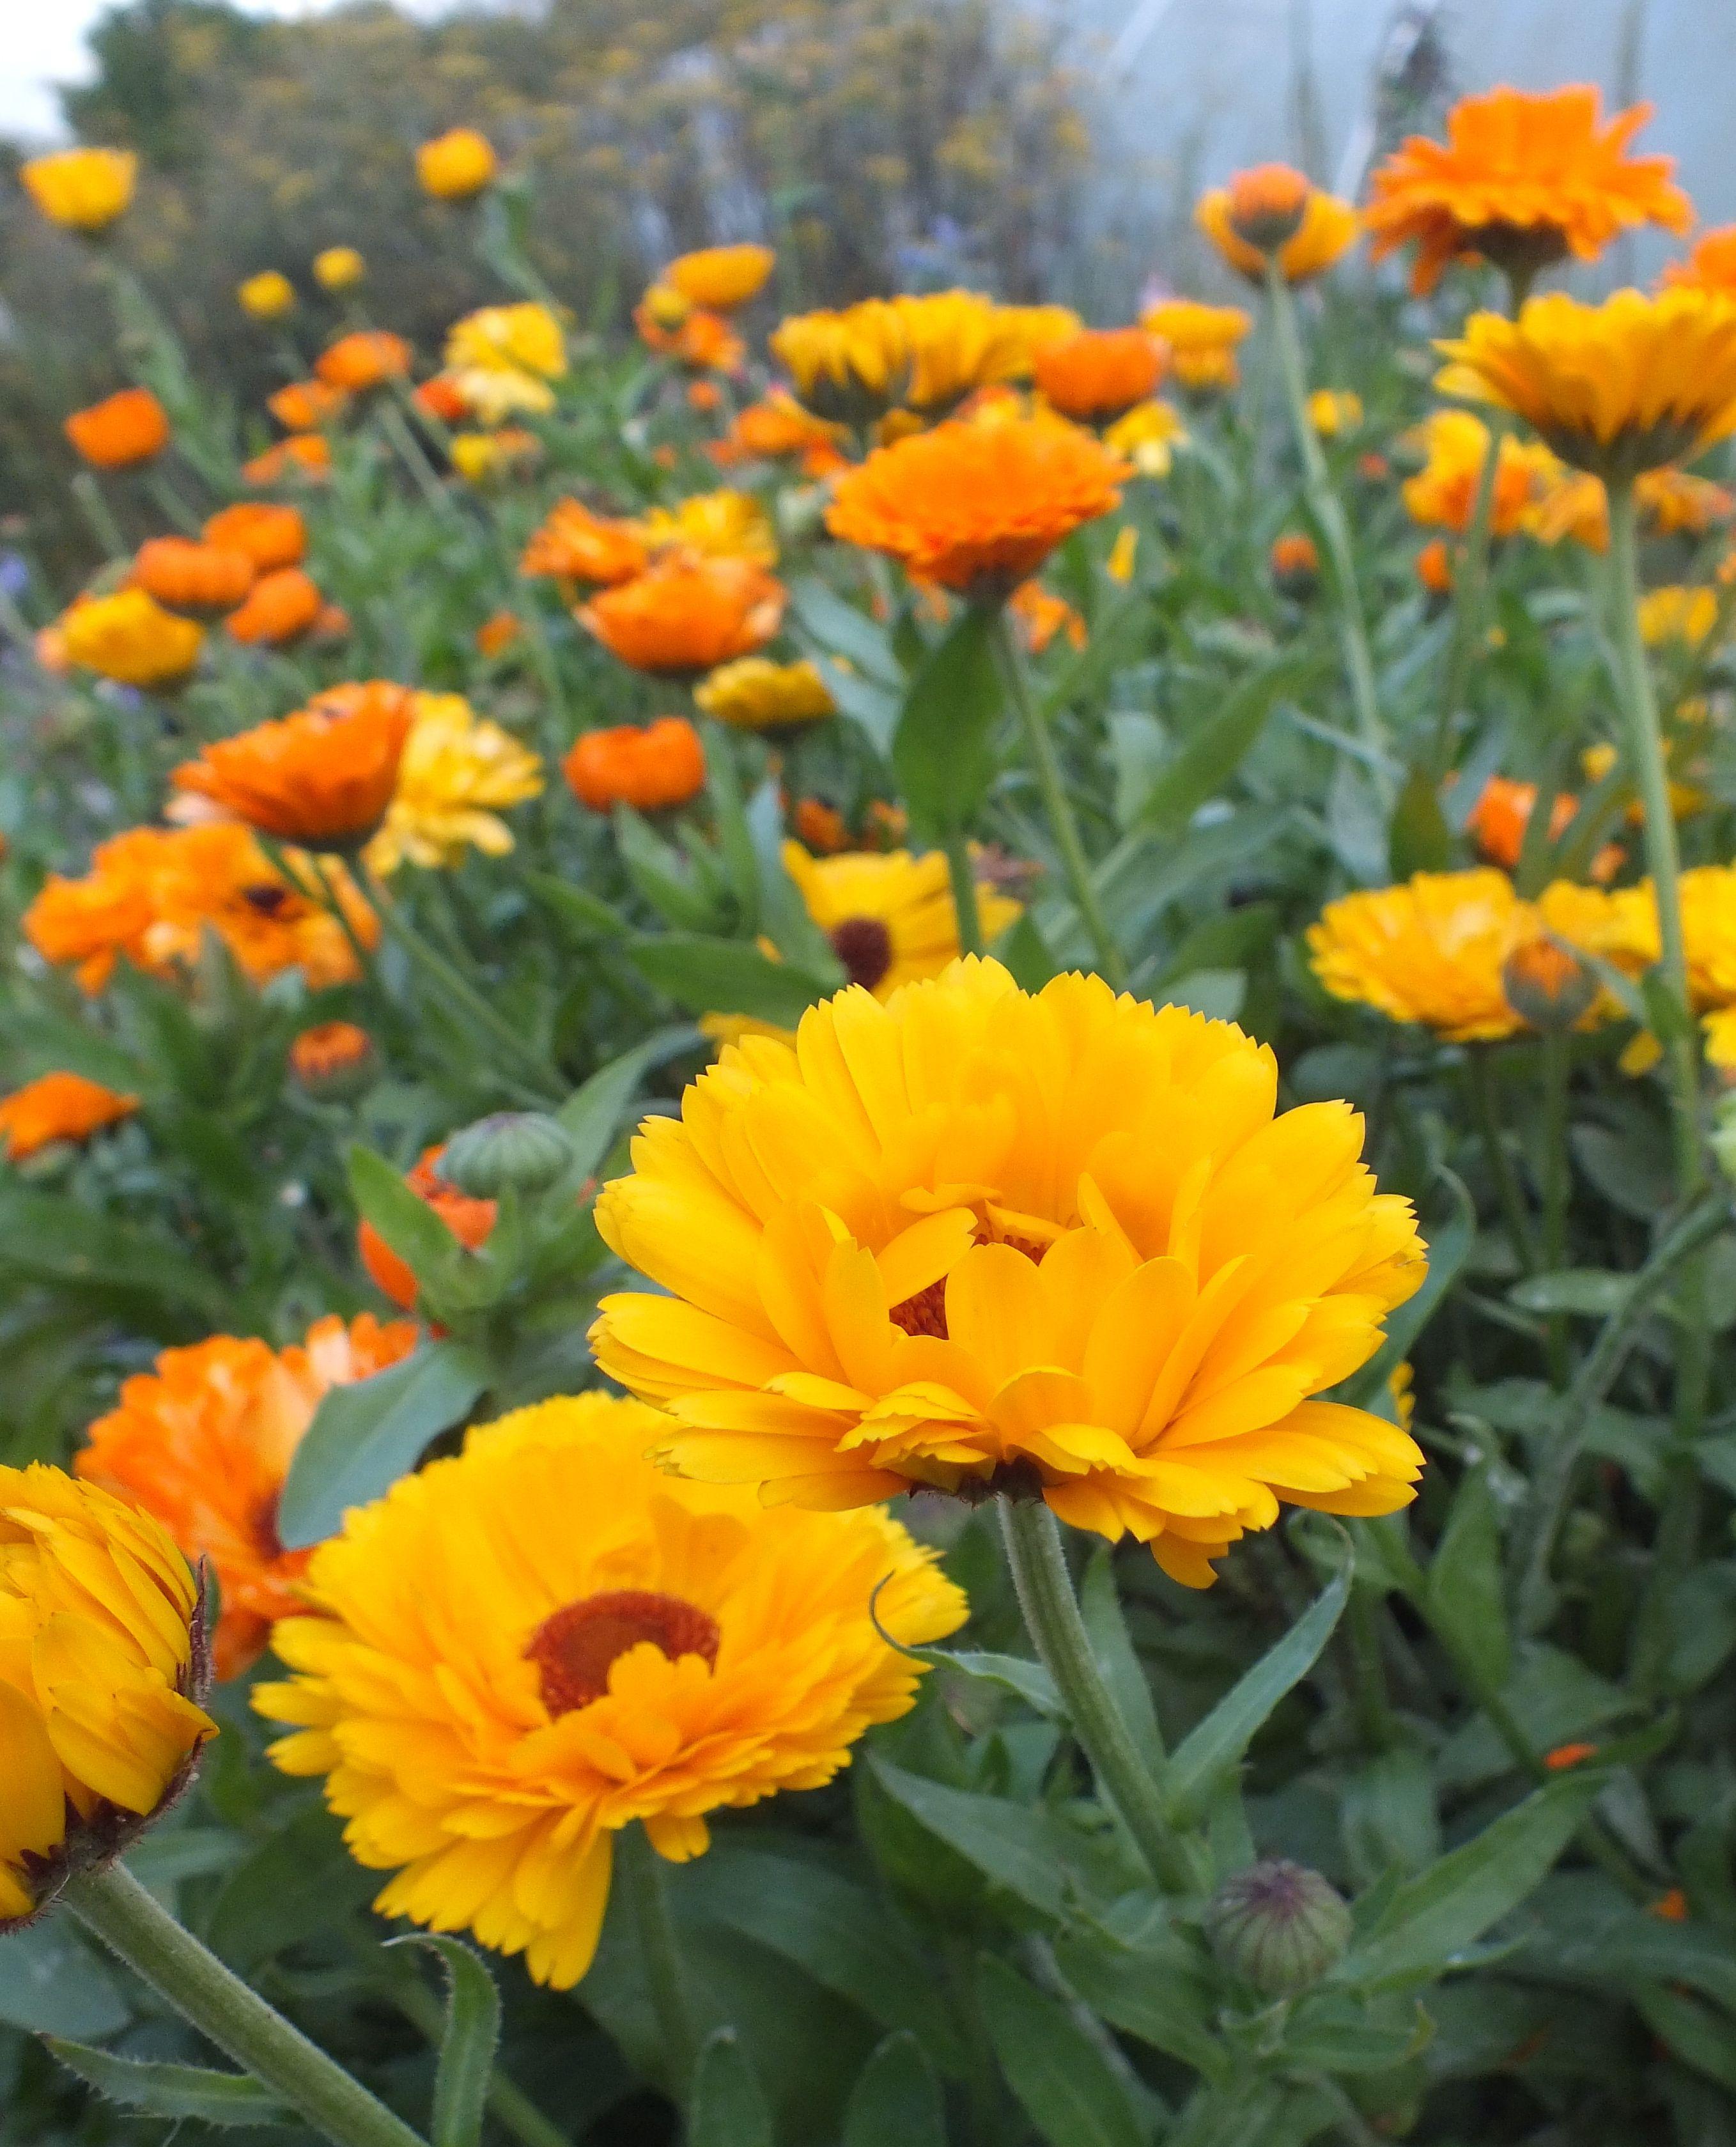 Calendula Officinalis Or P*T Marigold Prolific Self Seeder 400 x 300